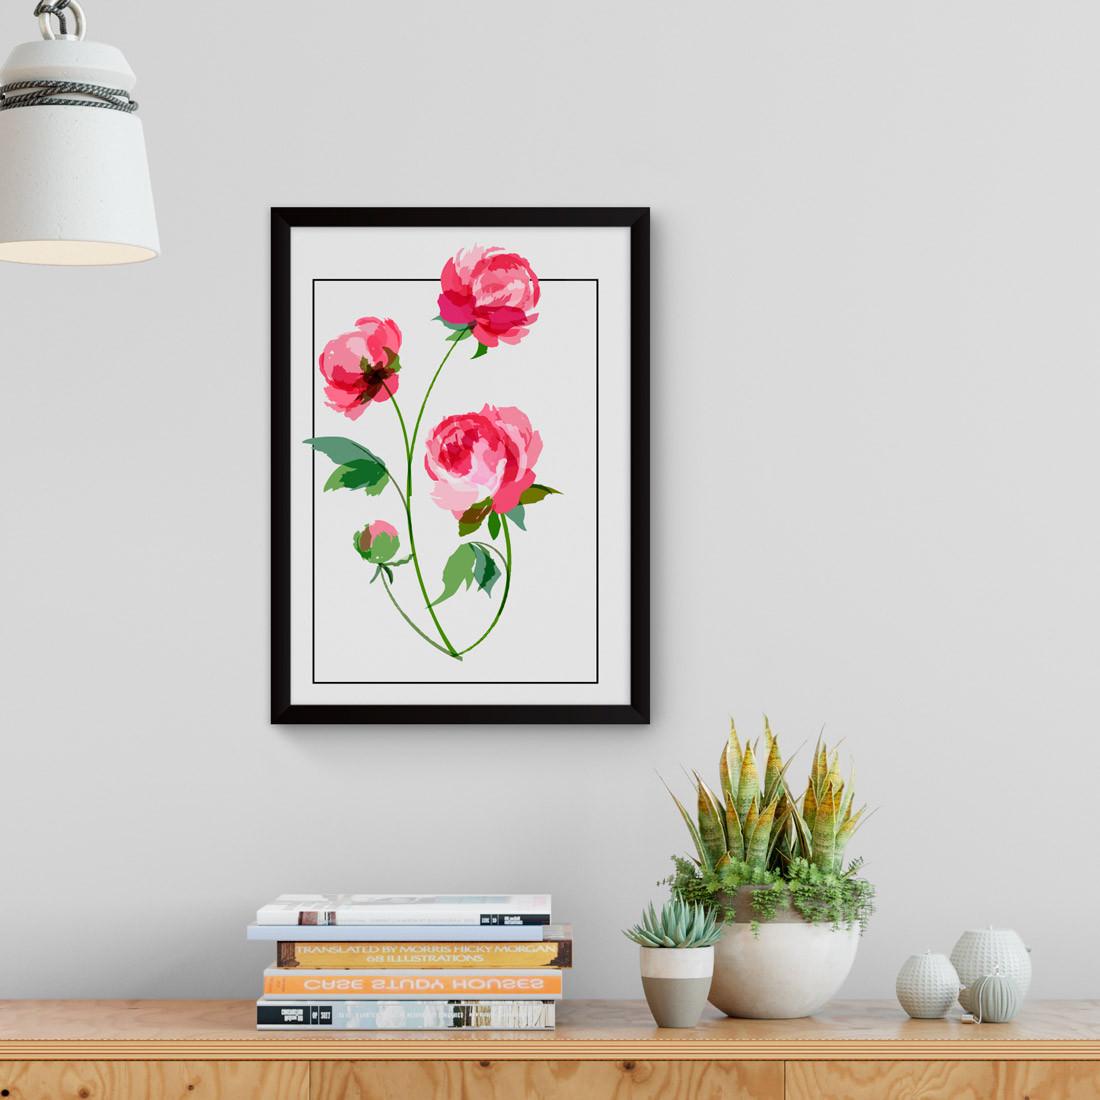 Quadro Decorativo Rosas